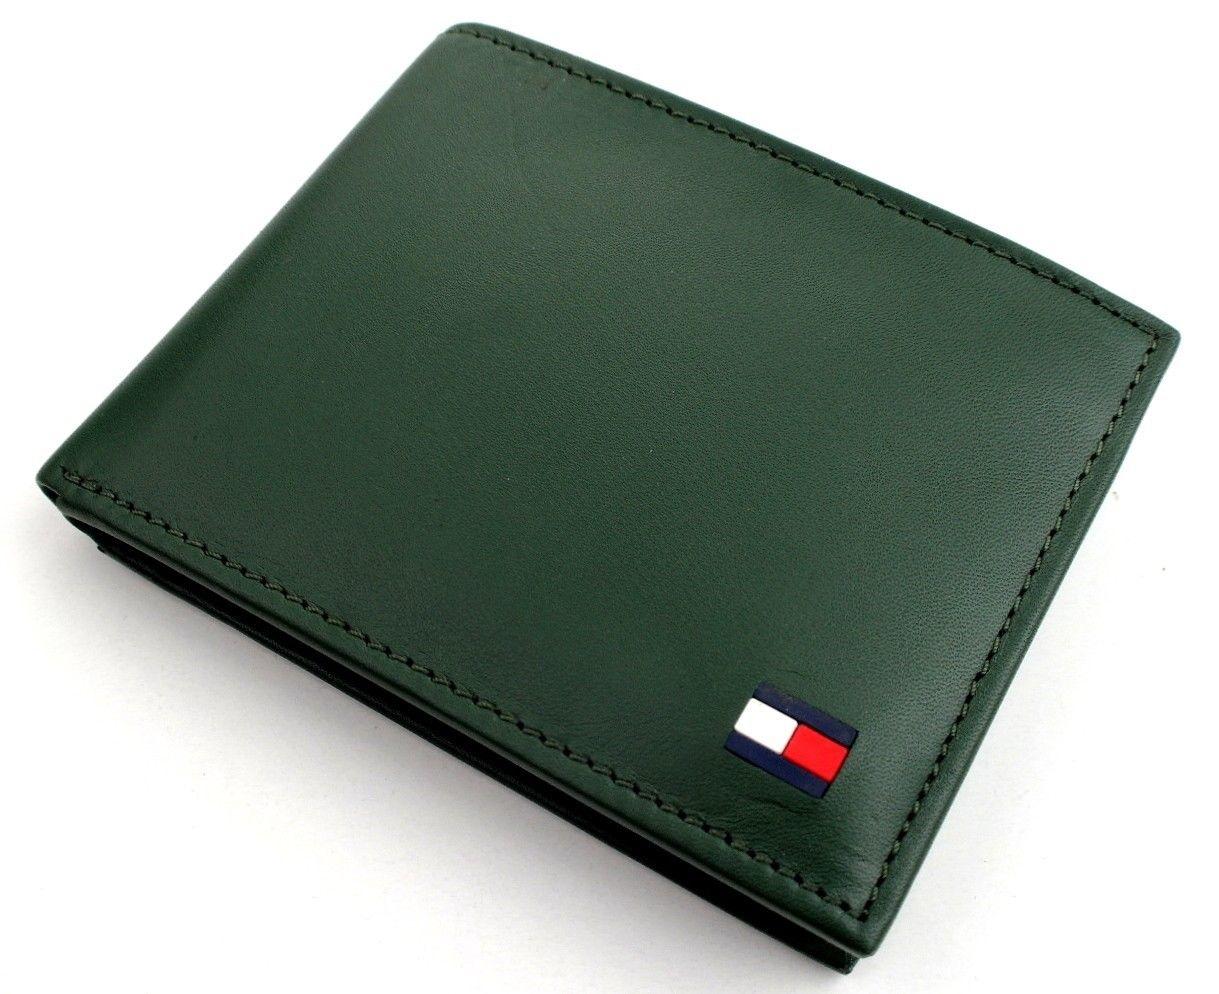 Tommy-Hilfiger-Men-039-s-Premium-Leather-Credit-Card-ID-Wallet-Passcase-31TL22X046 thumbnail 24